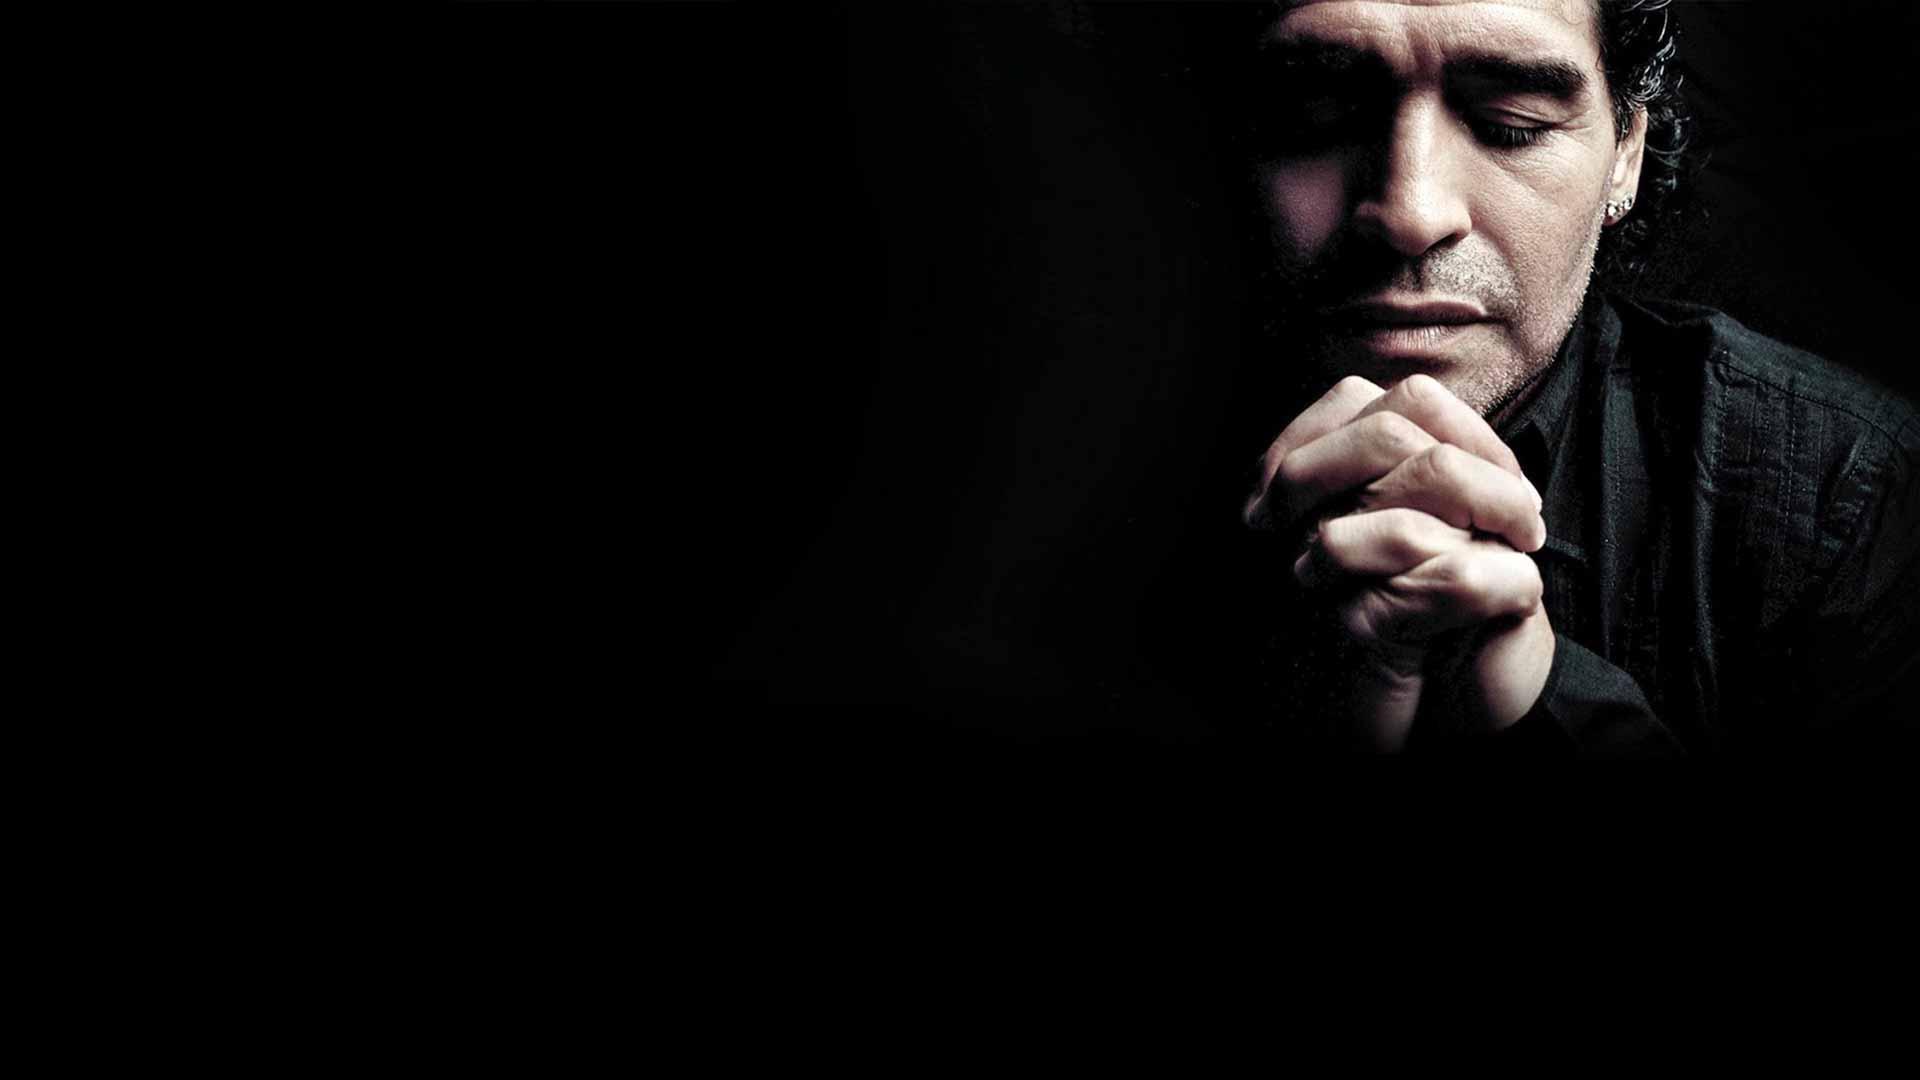 NOVE HD Maradona: le verita' nascoste